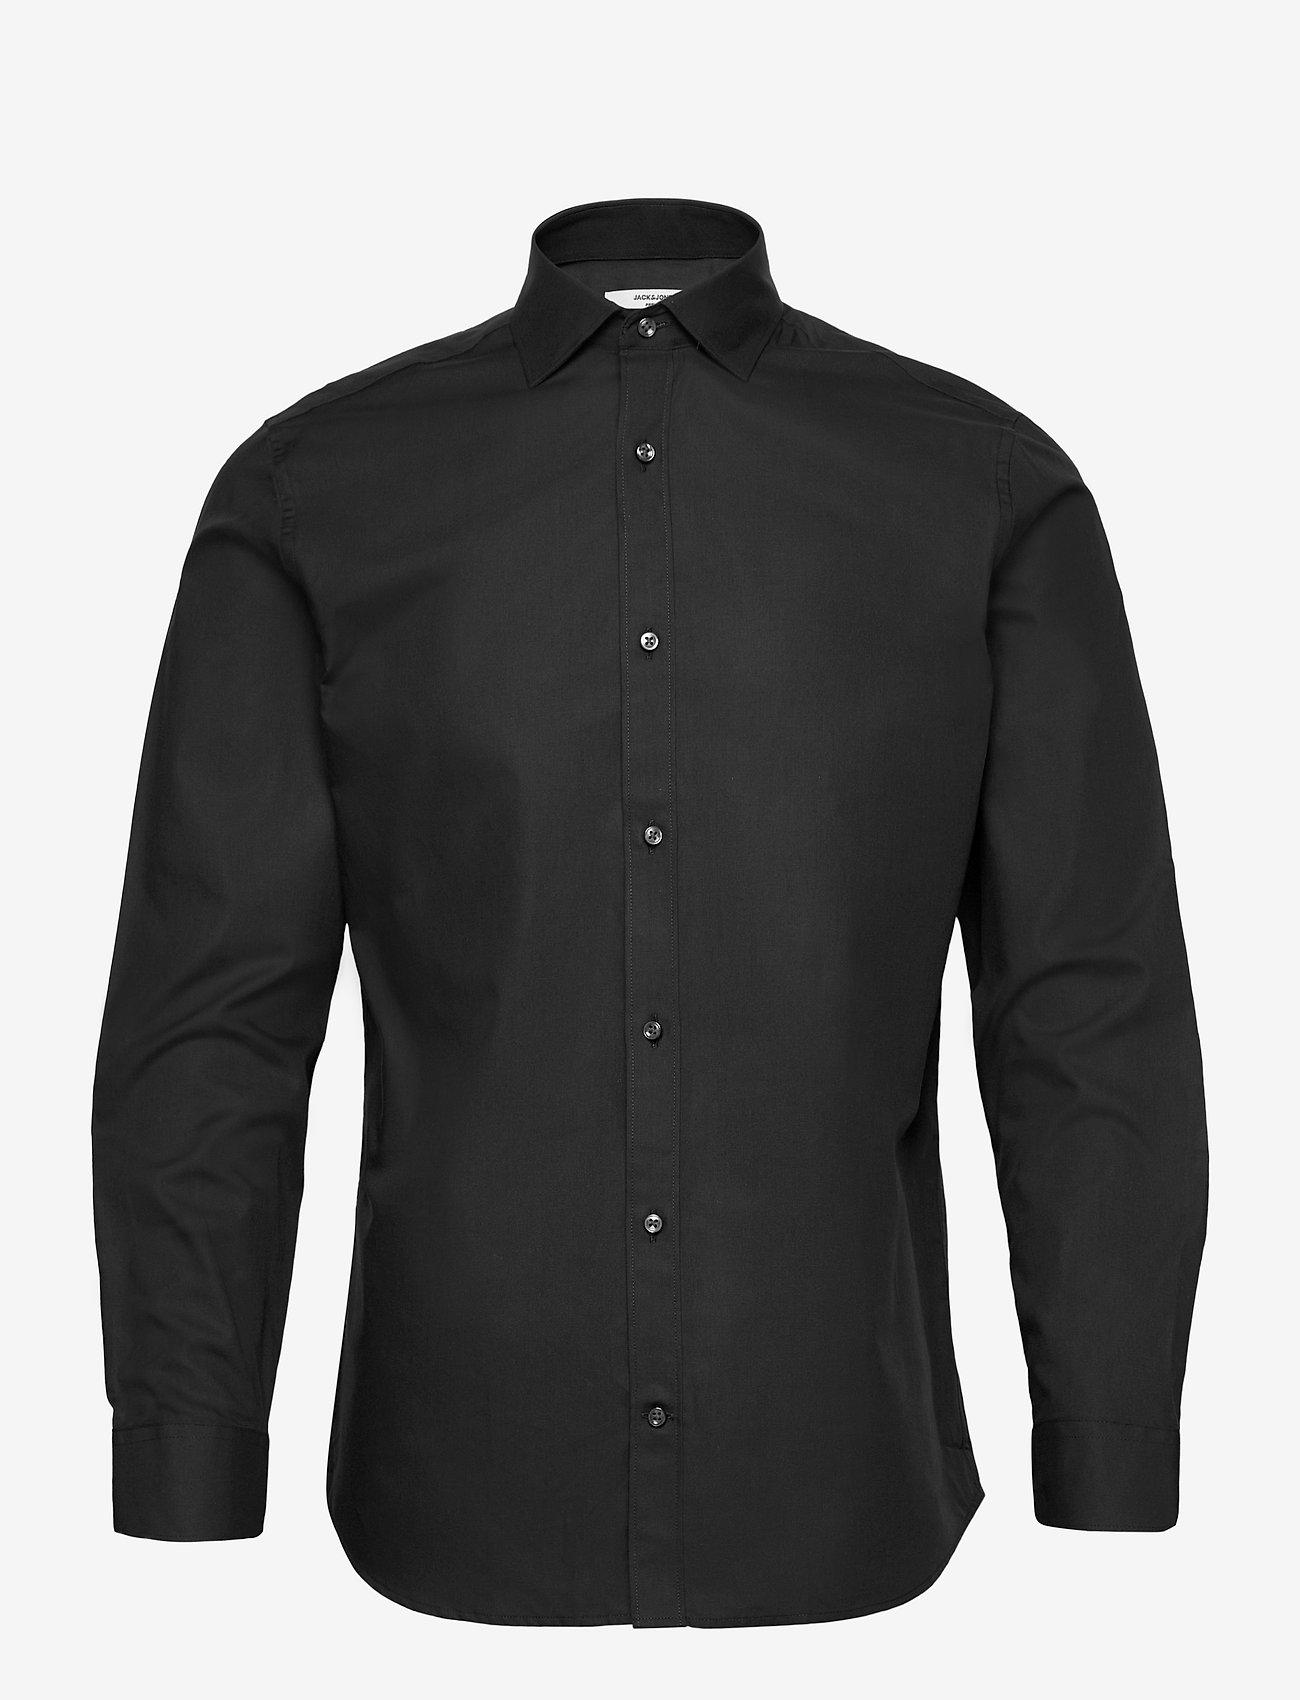 Jack & Jones - JPRBLAROYAL SHIRT L/S - basic skjortor - black - 0